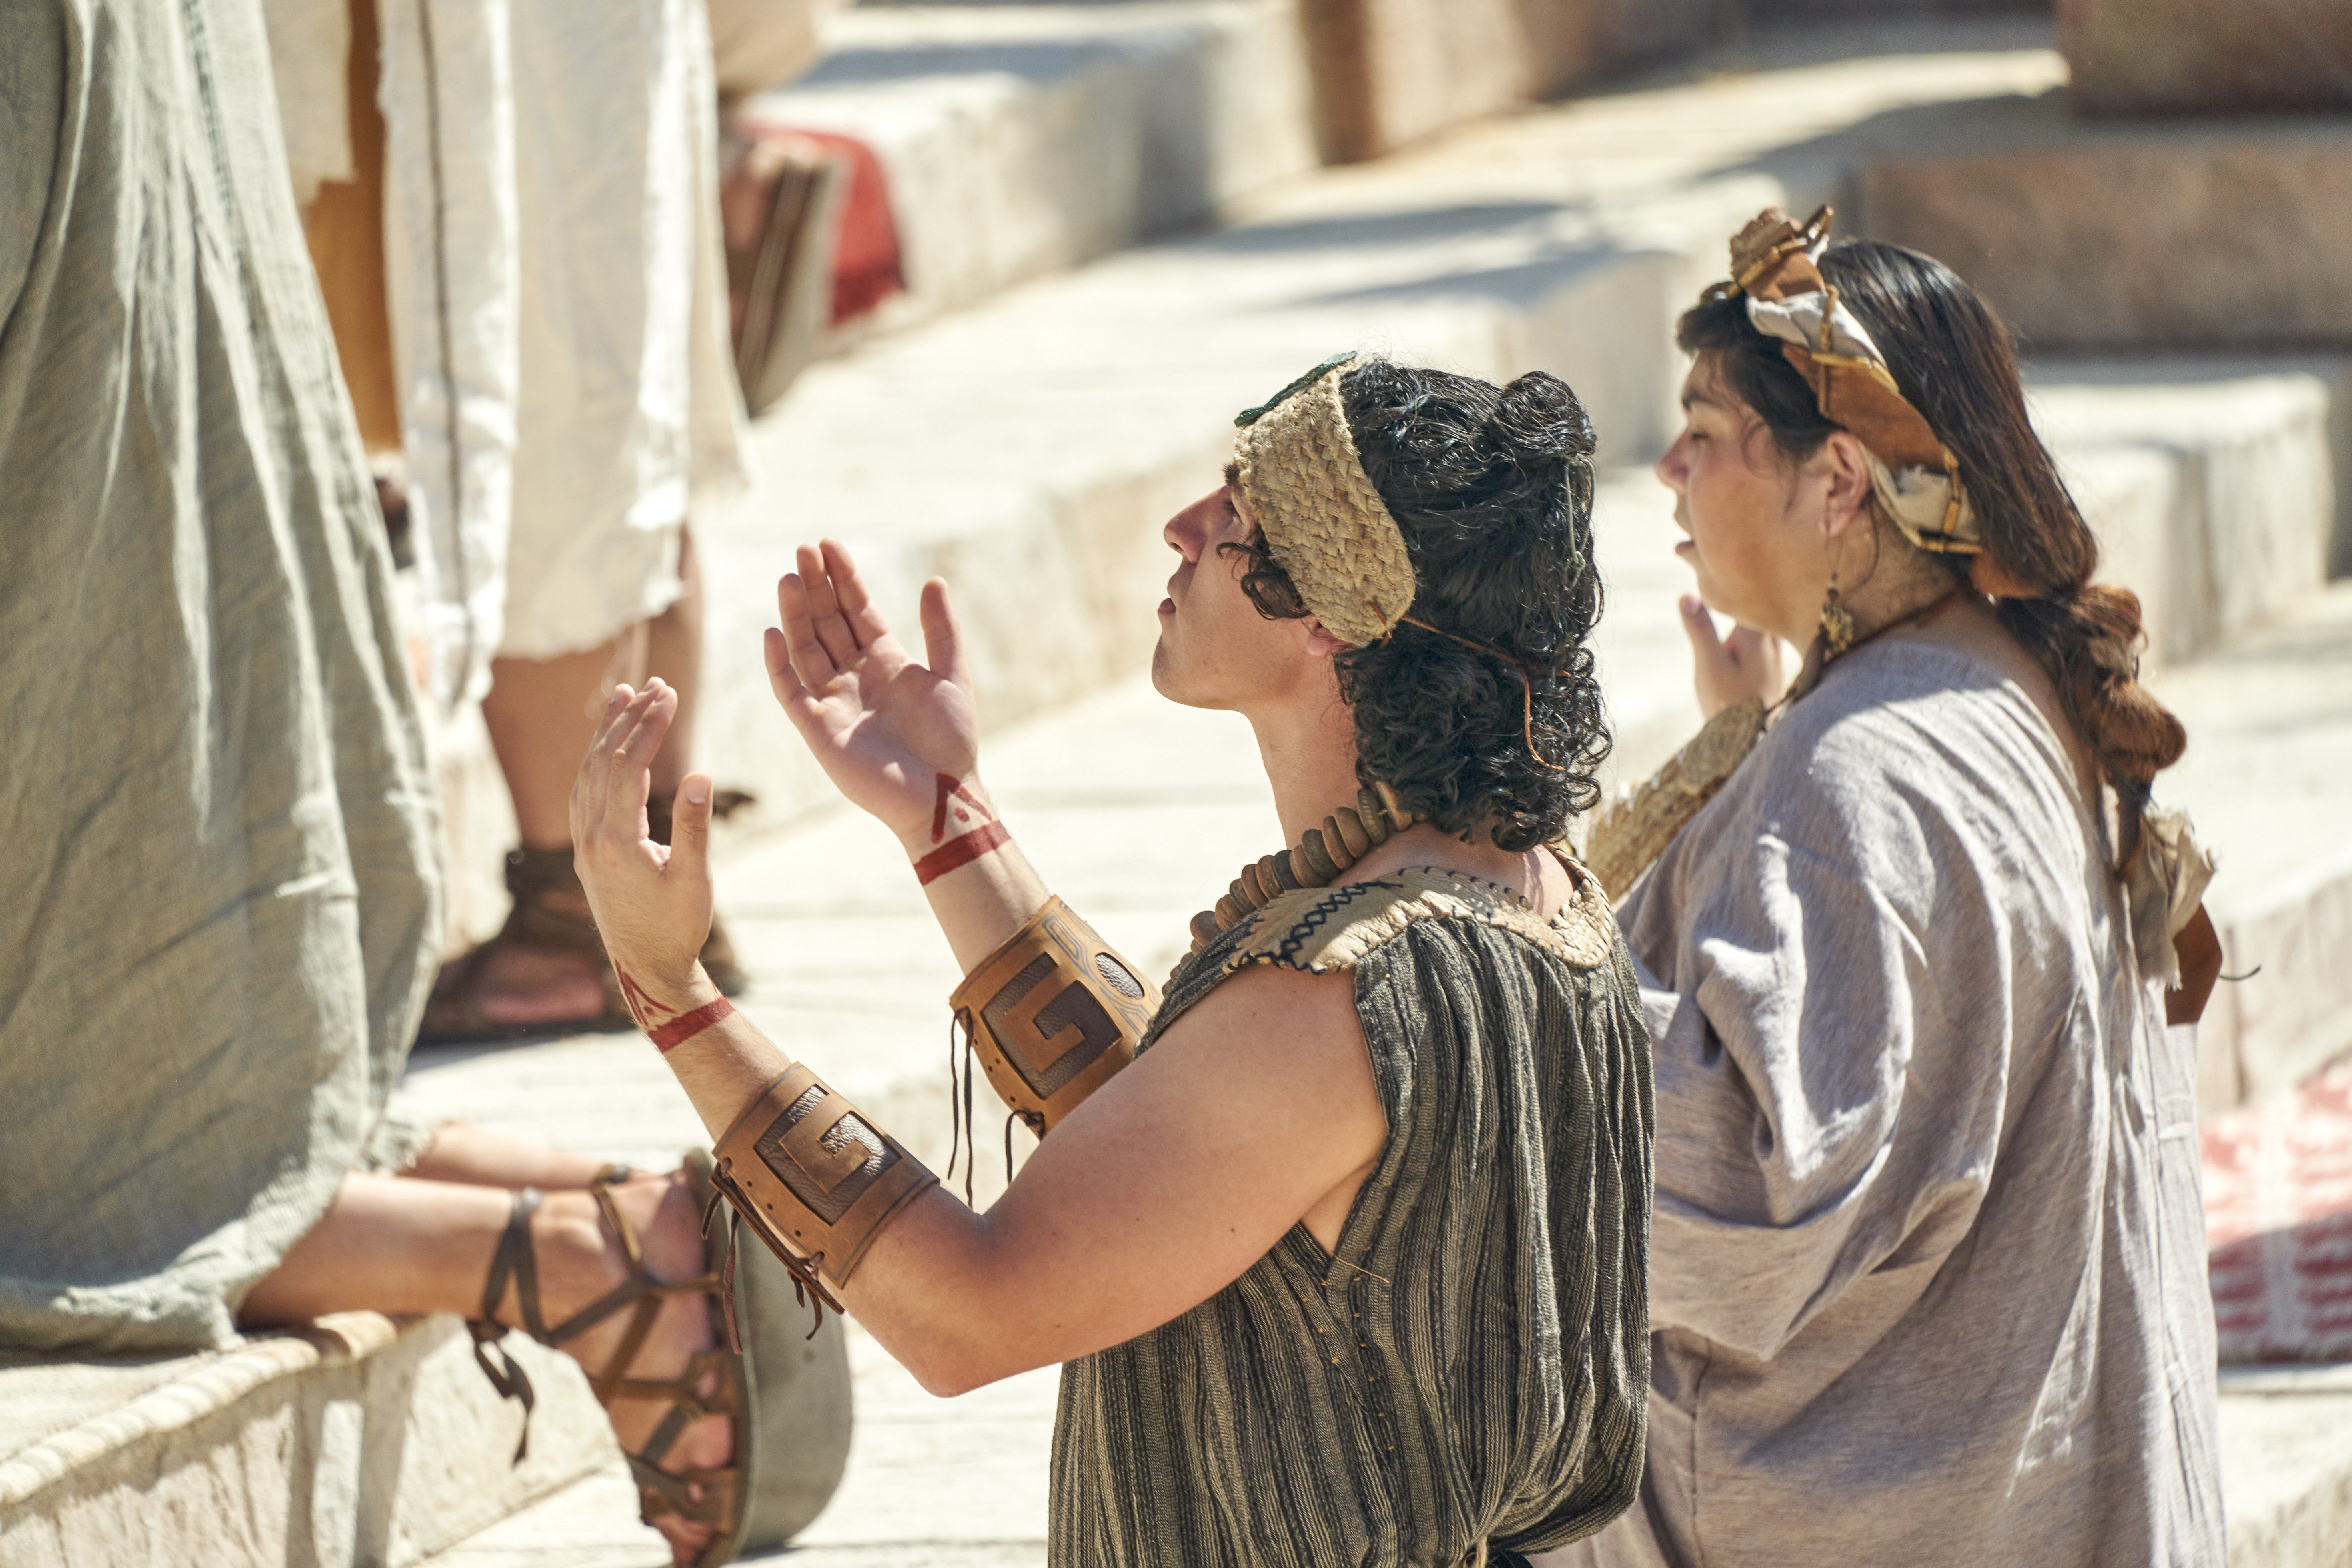 Zoramites pray near the Rameumptom in the land of Antionum.